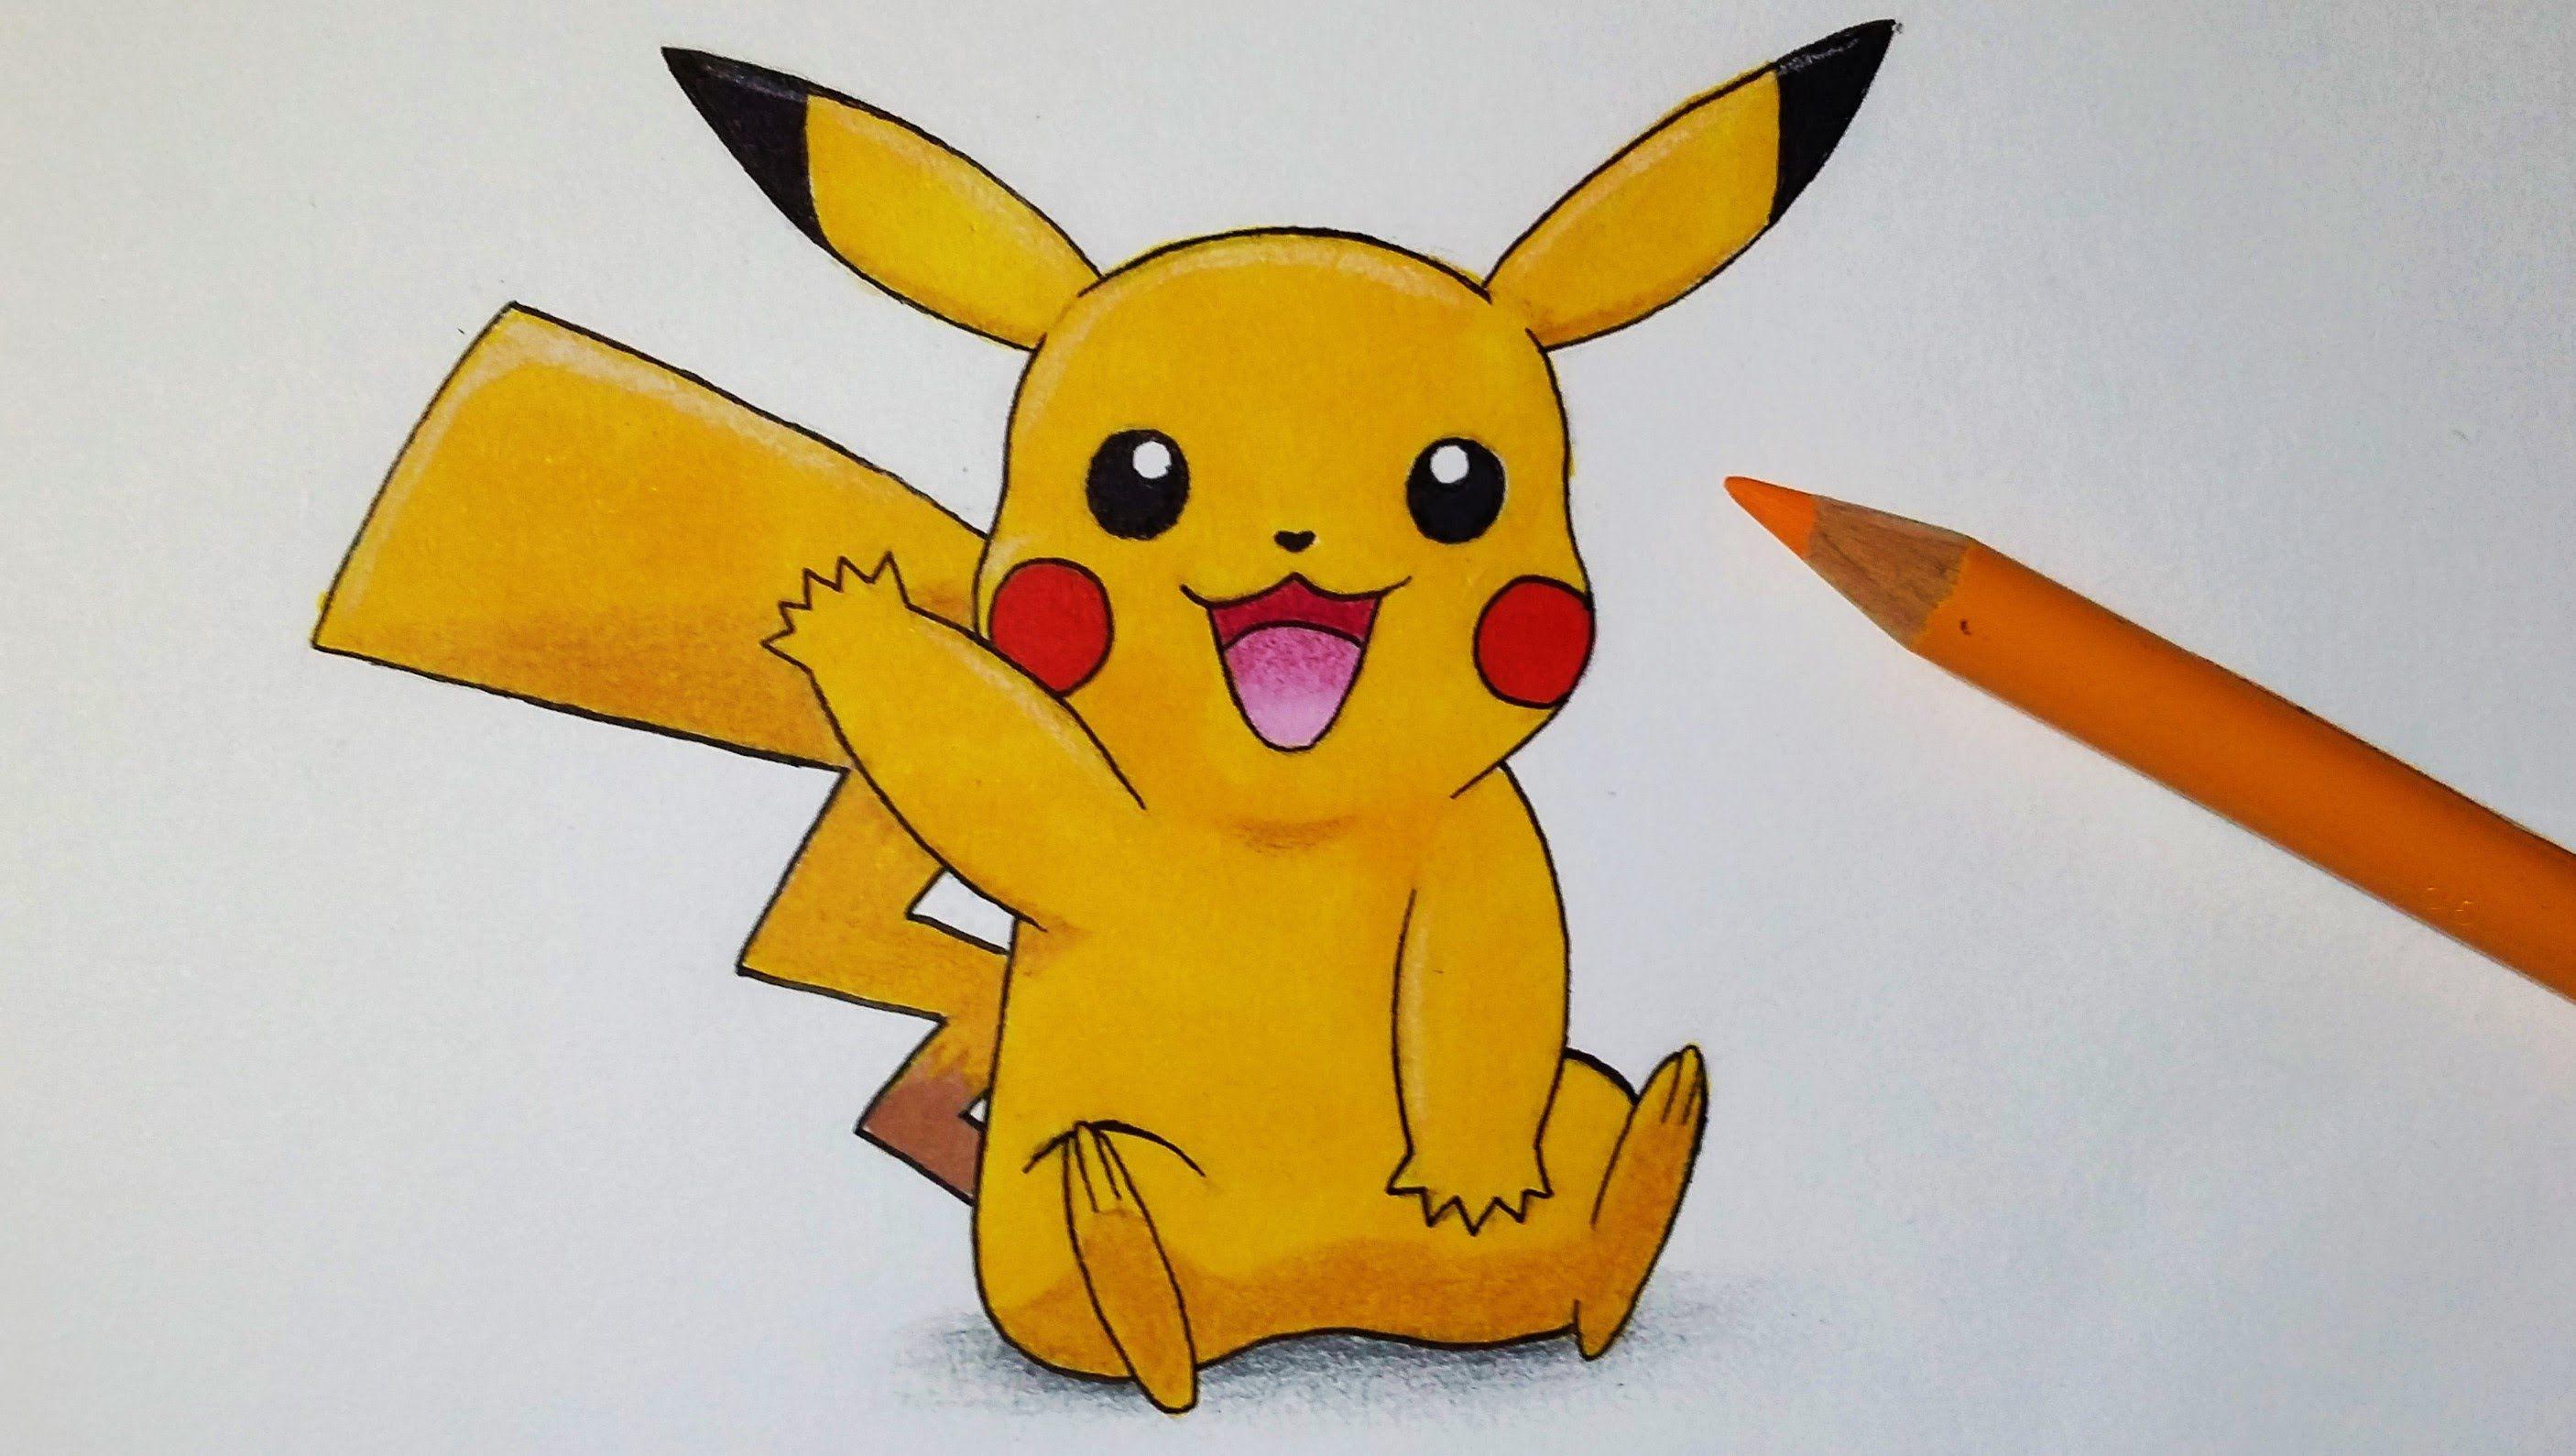 Comment dessiner Pikachu Tutoriel | Dessin pikachu, Comment dessiner pikachu, Coloriage pikachu